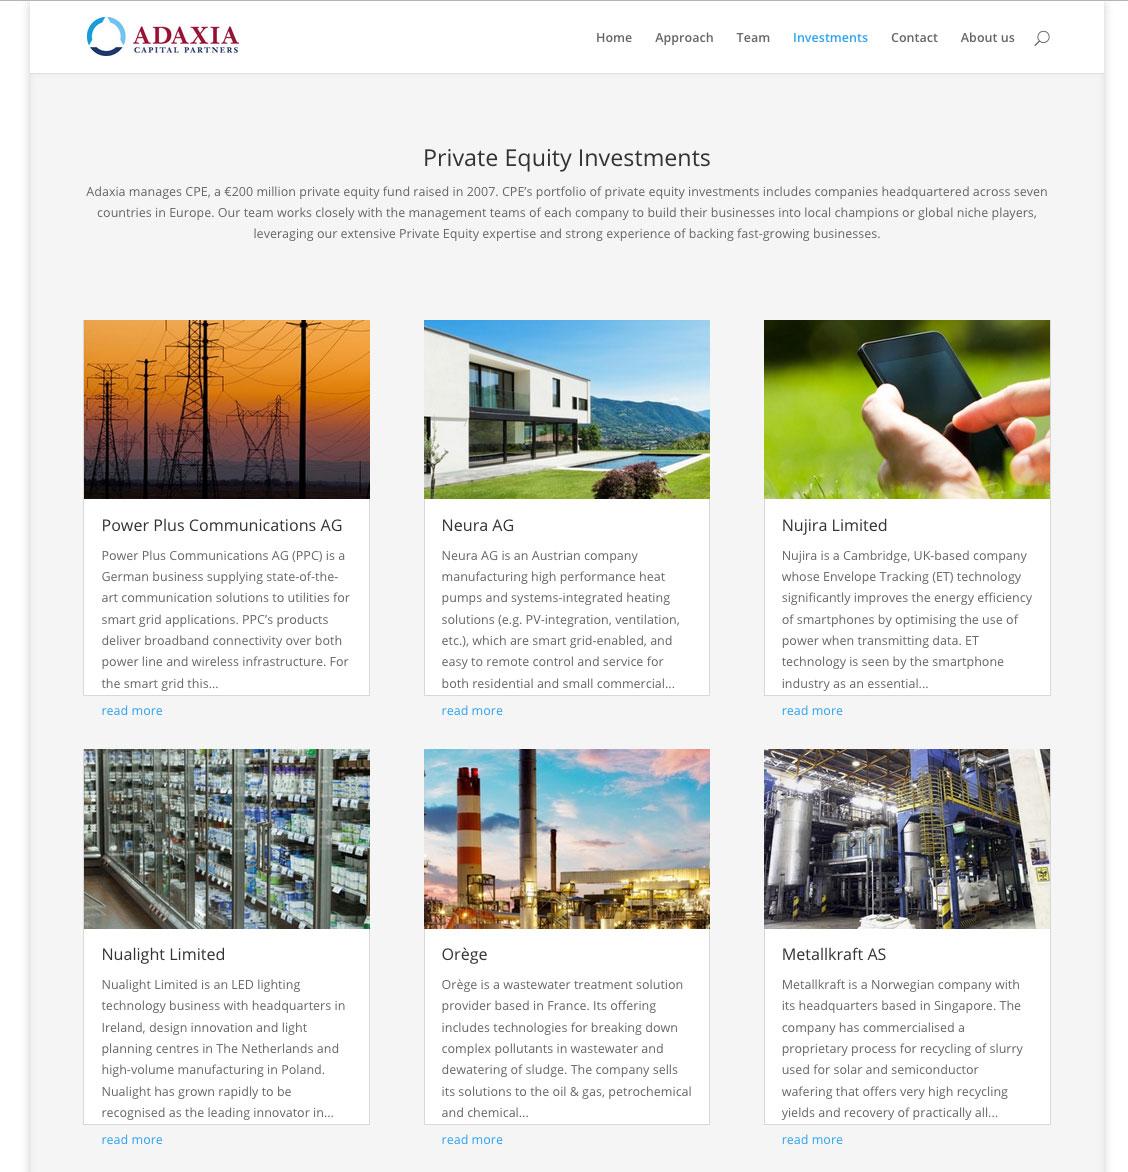 punktneun-Adaxia-Webseite-Investmentseite